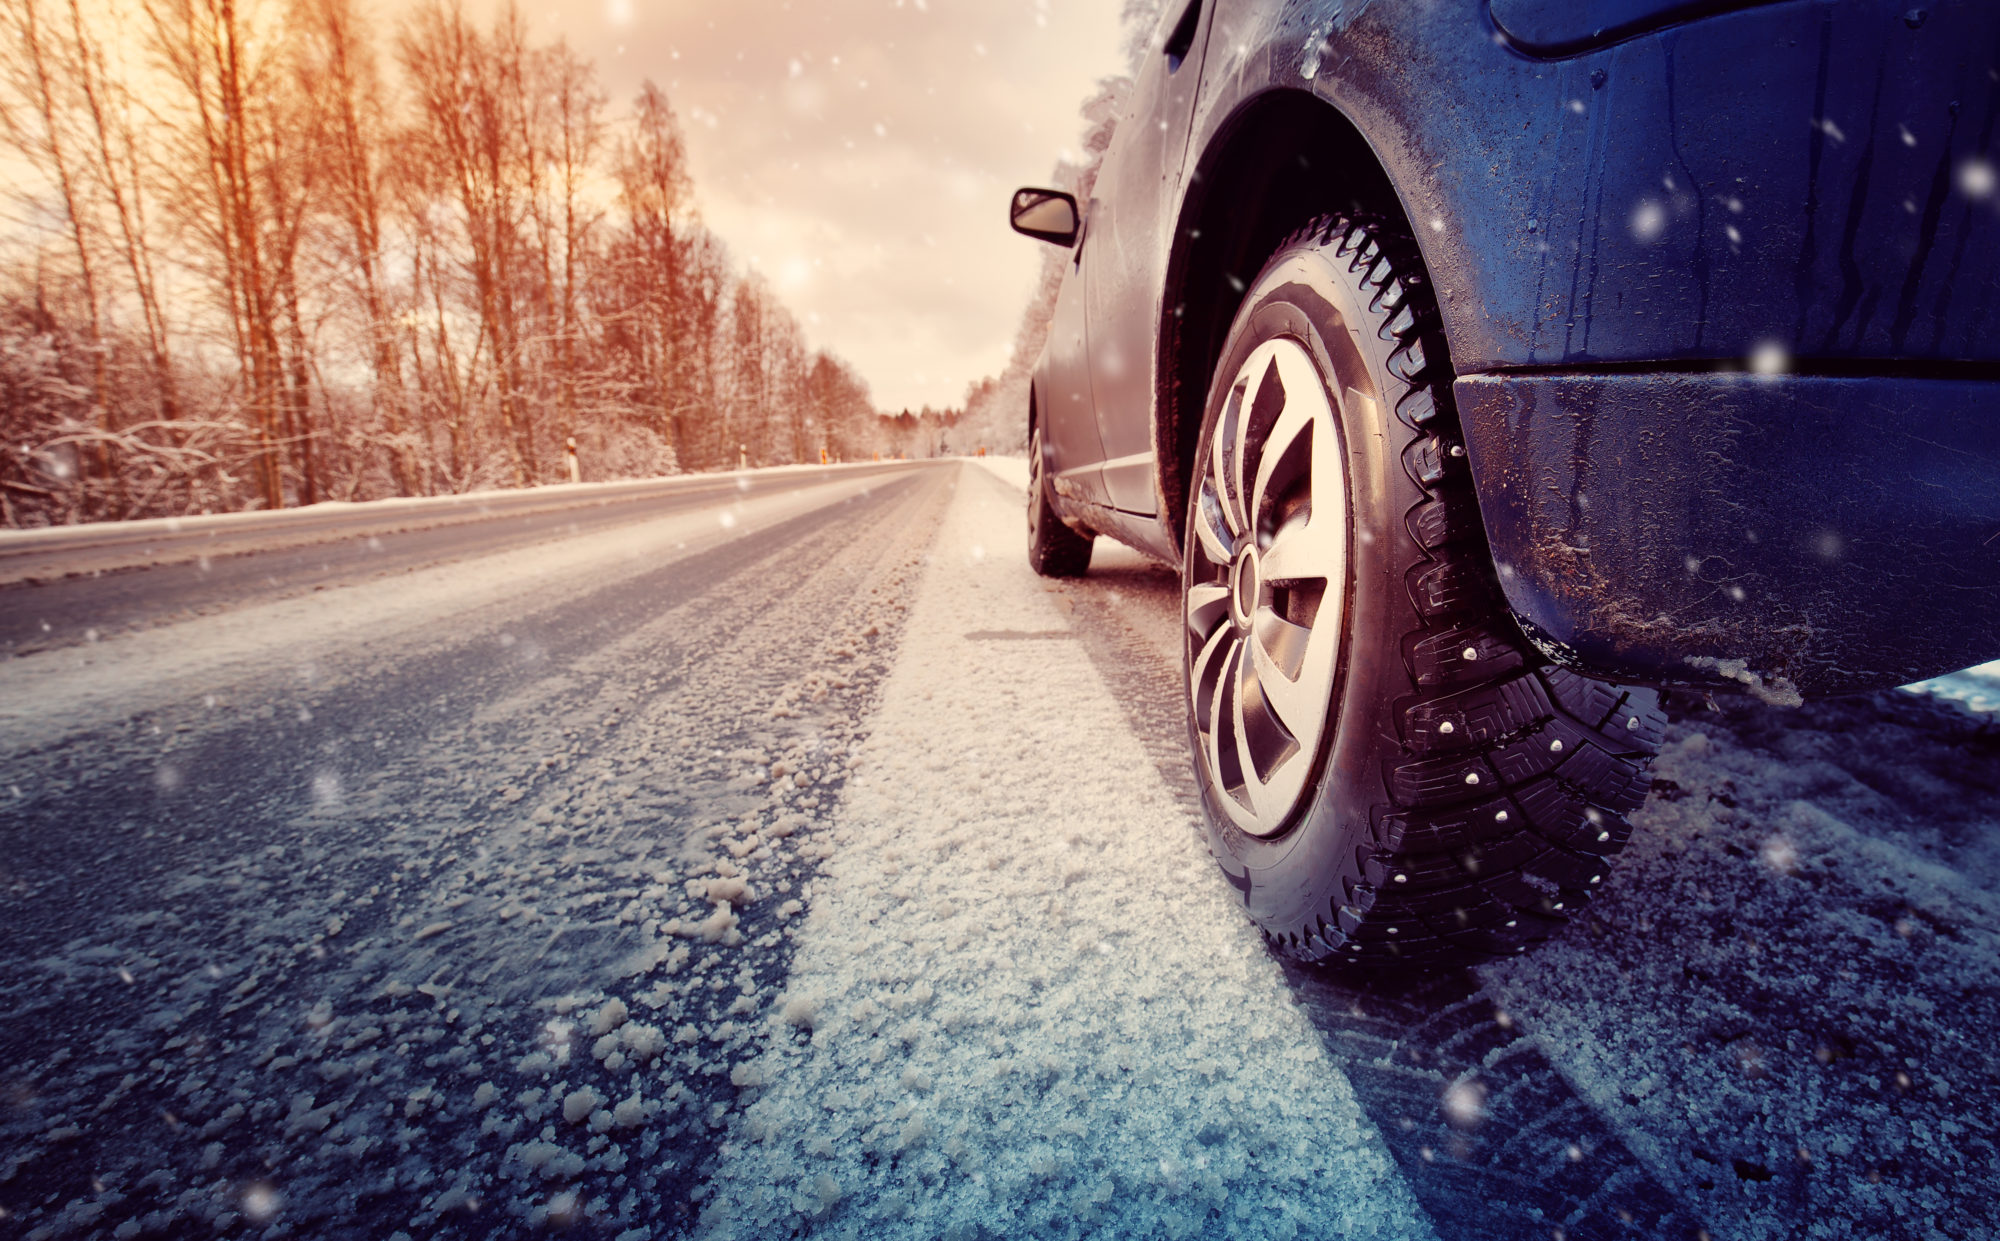 cars navigating winter weather in Nashville, TN